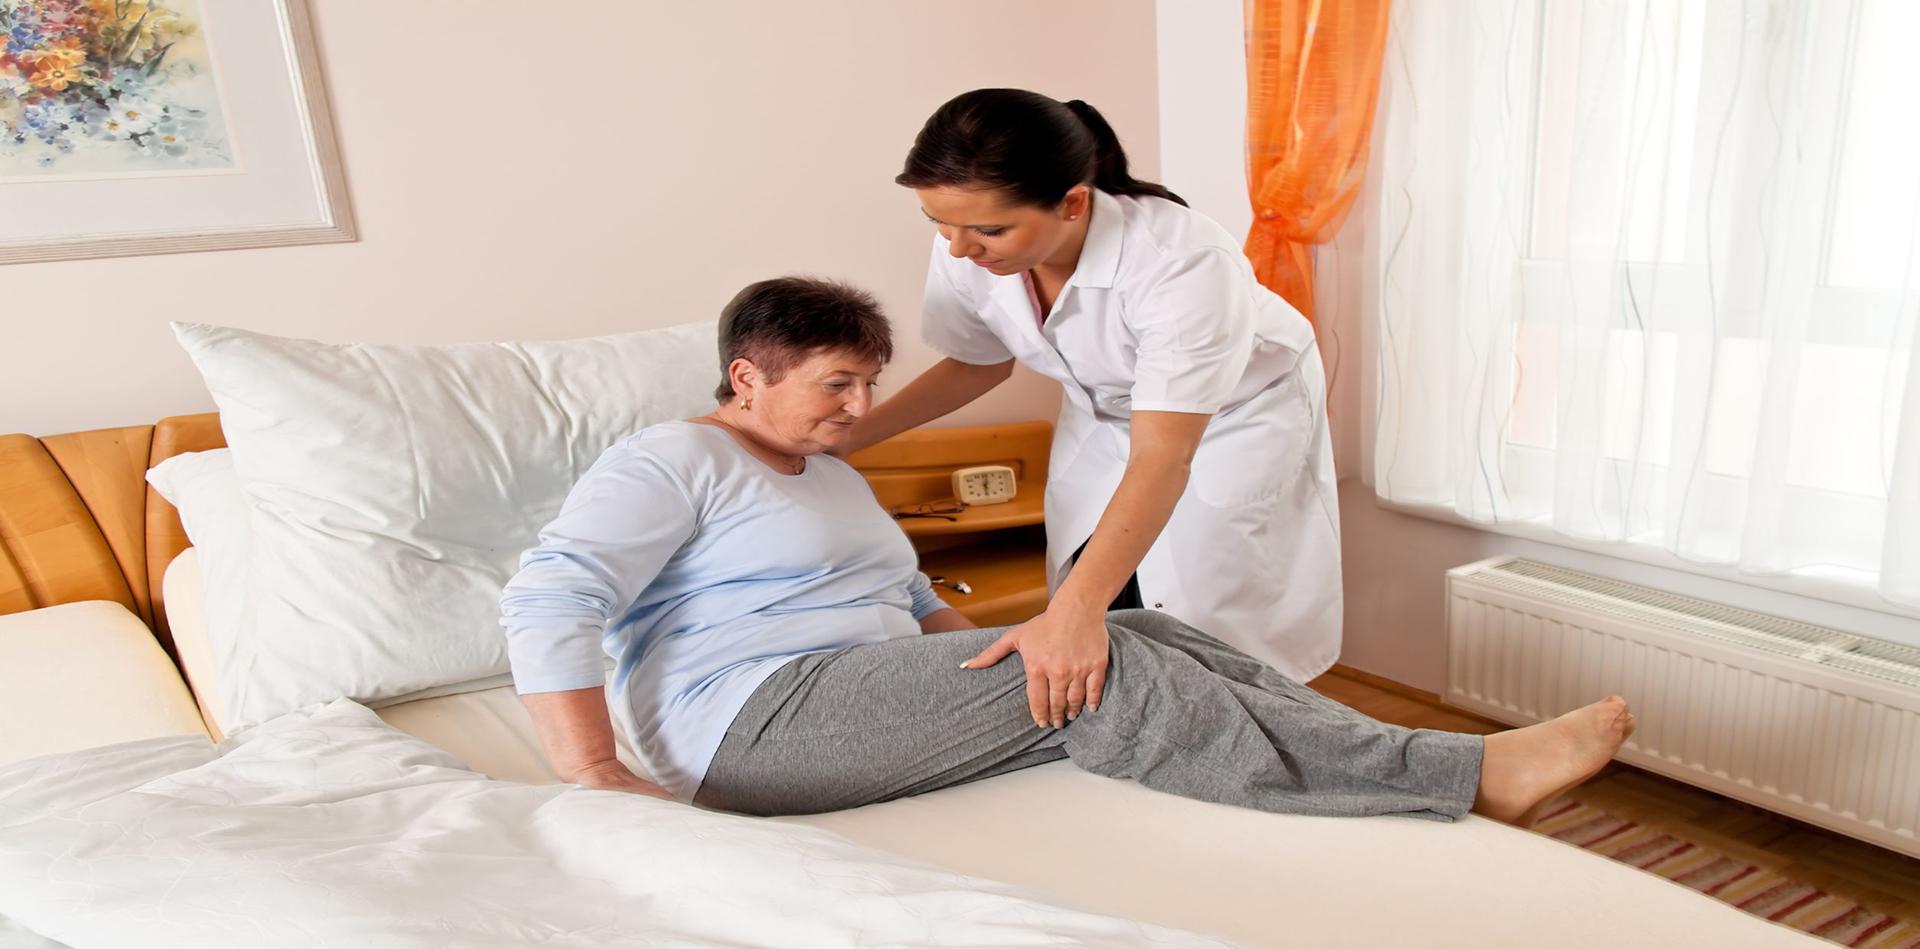 курс социален аситент, курс болногледач, курс домашен помощник